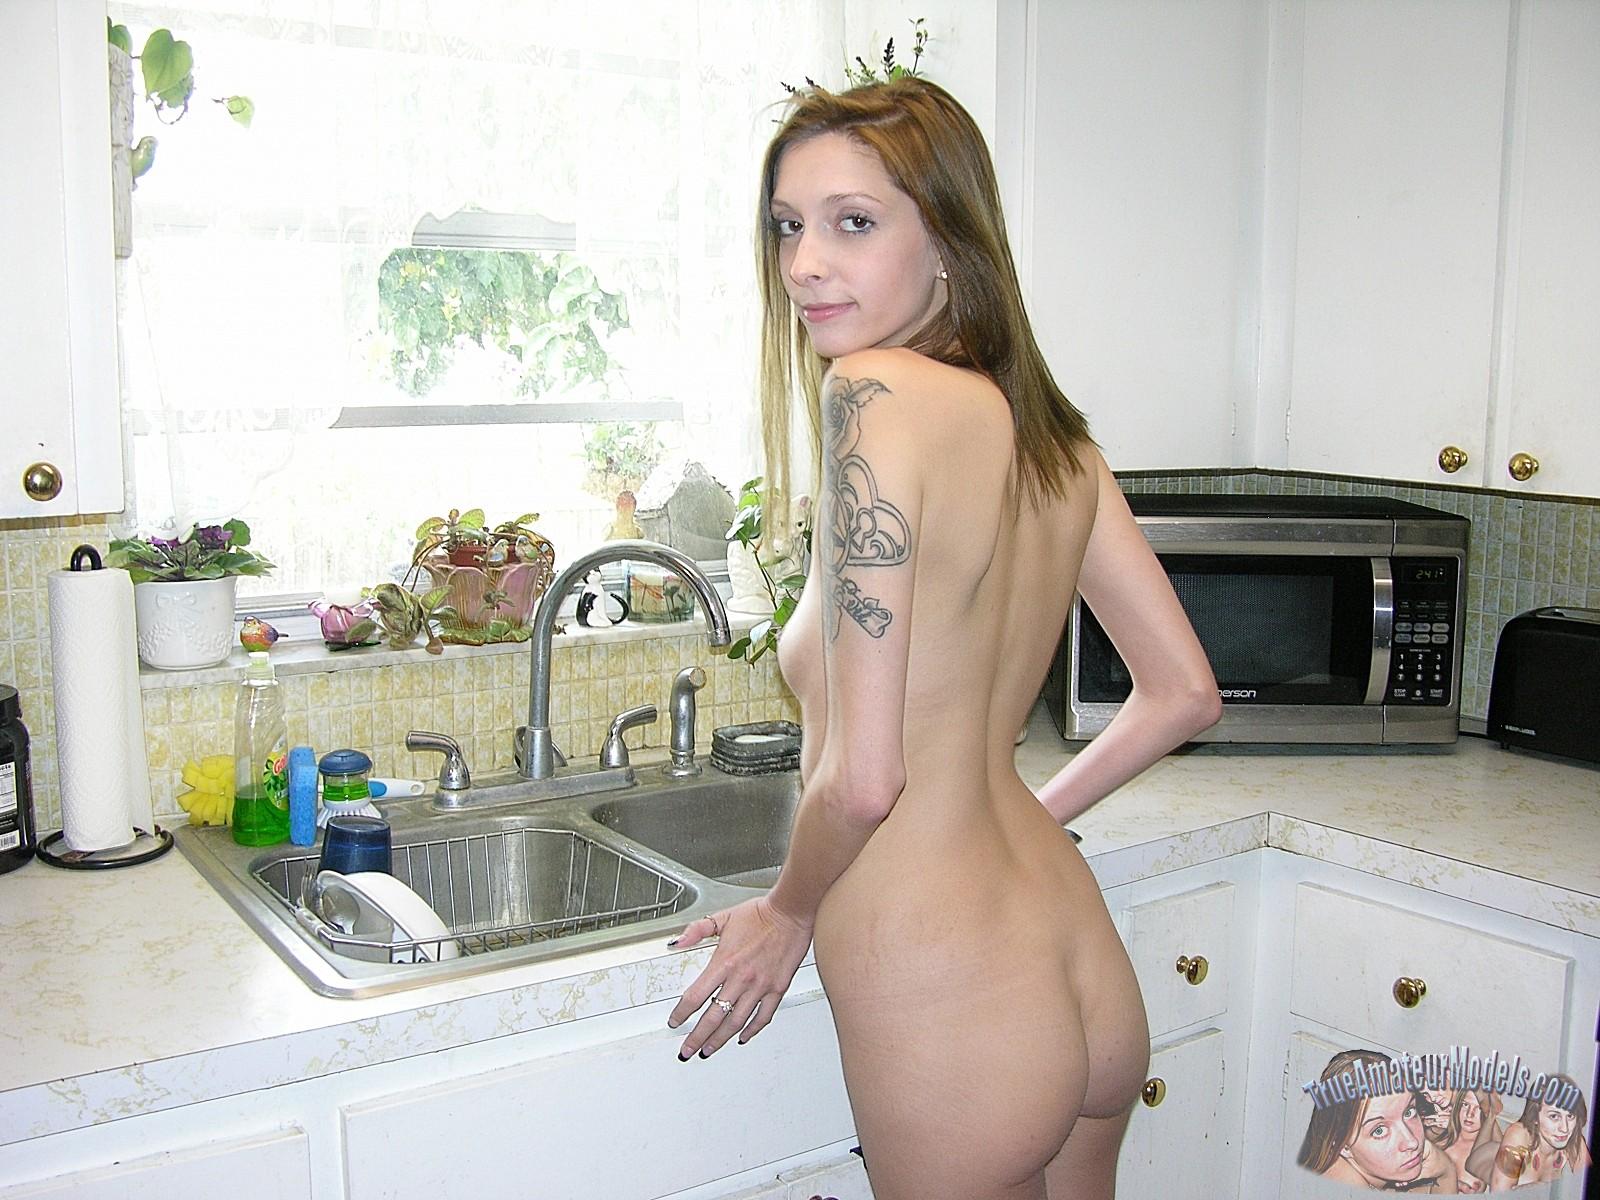 skinny-nude-tattooed-babe-vicki-model13